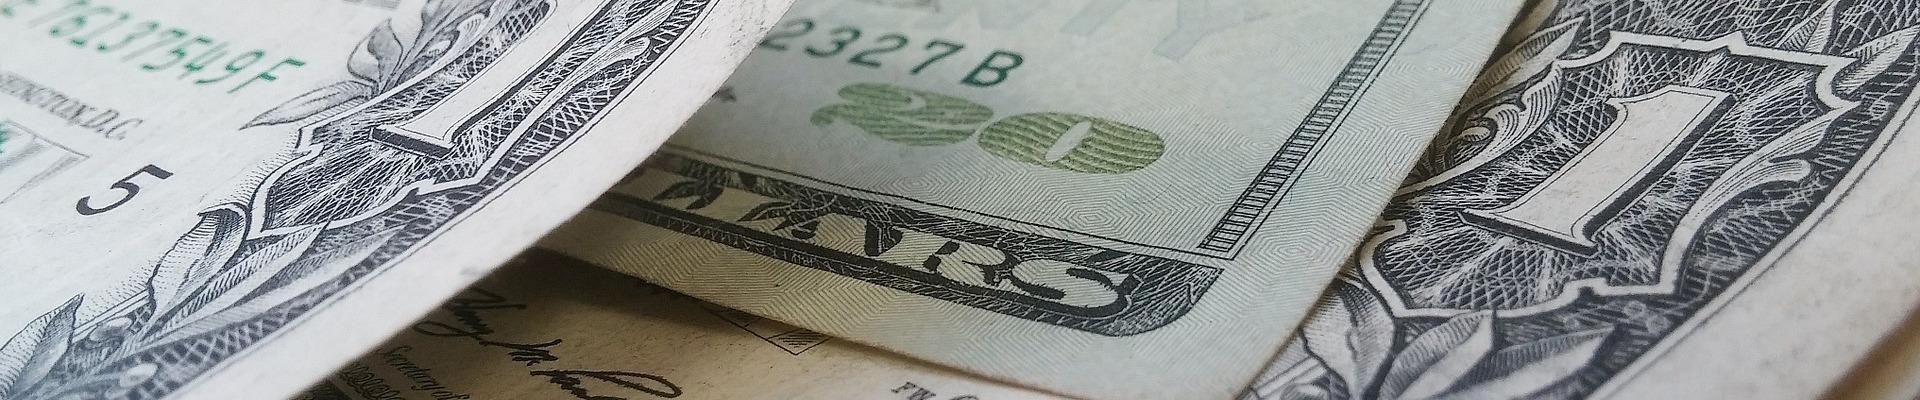 dollars-426023_1920 copy